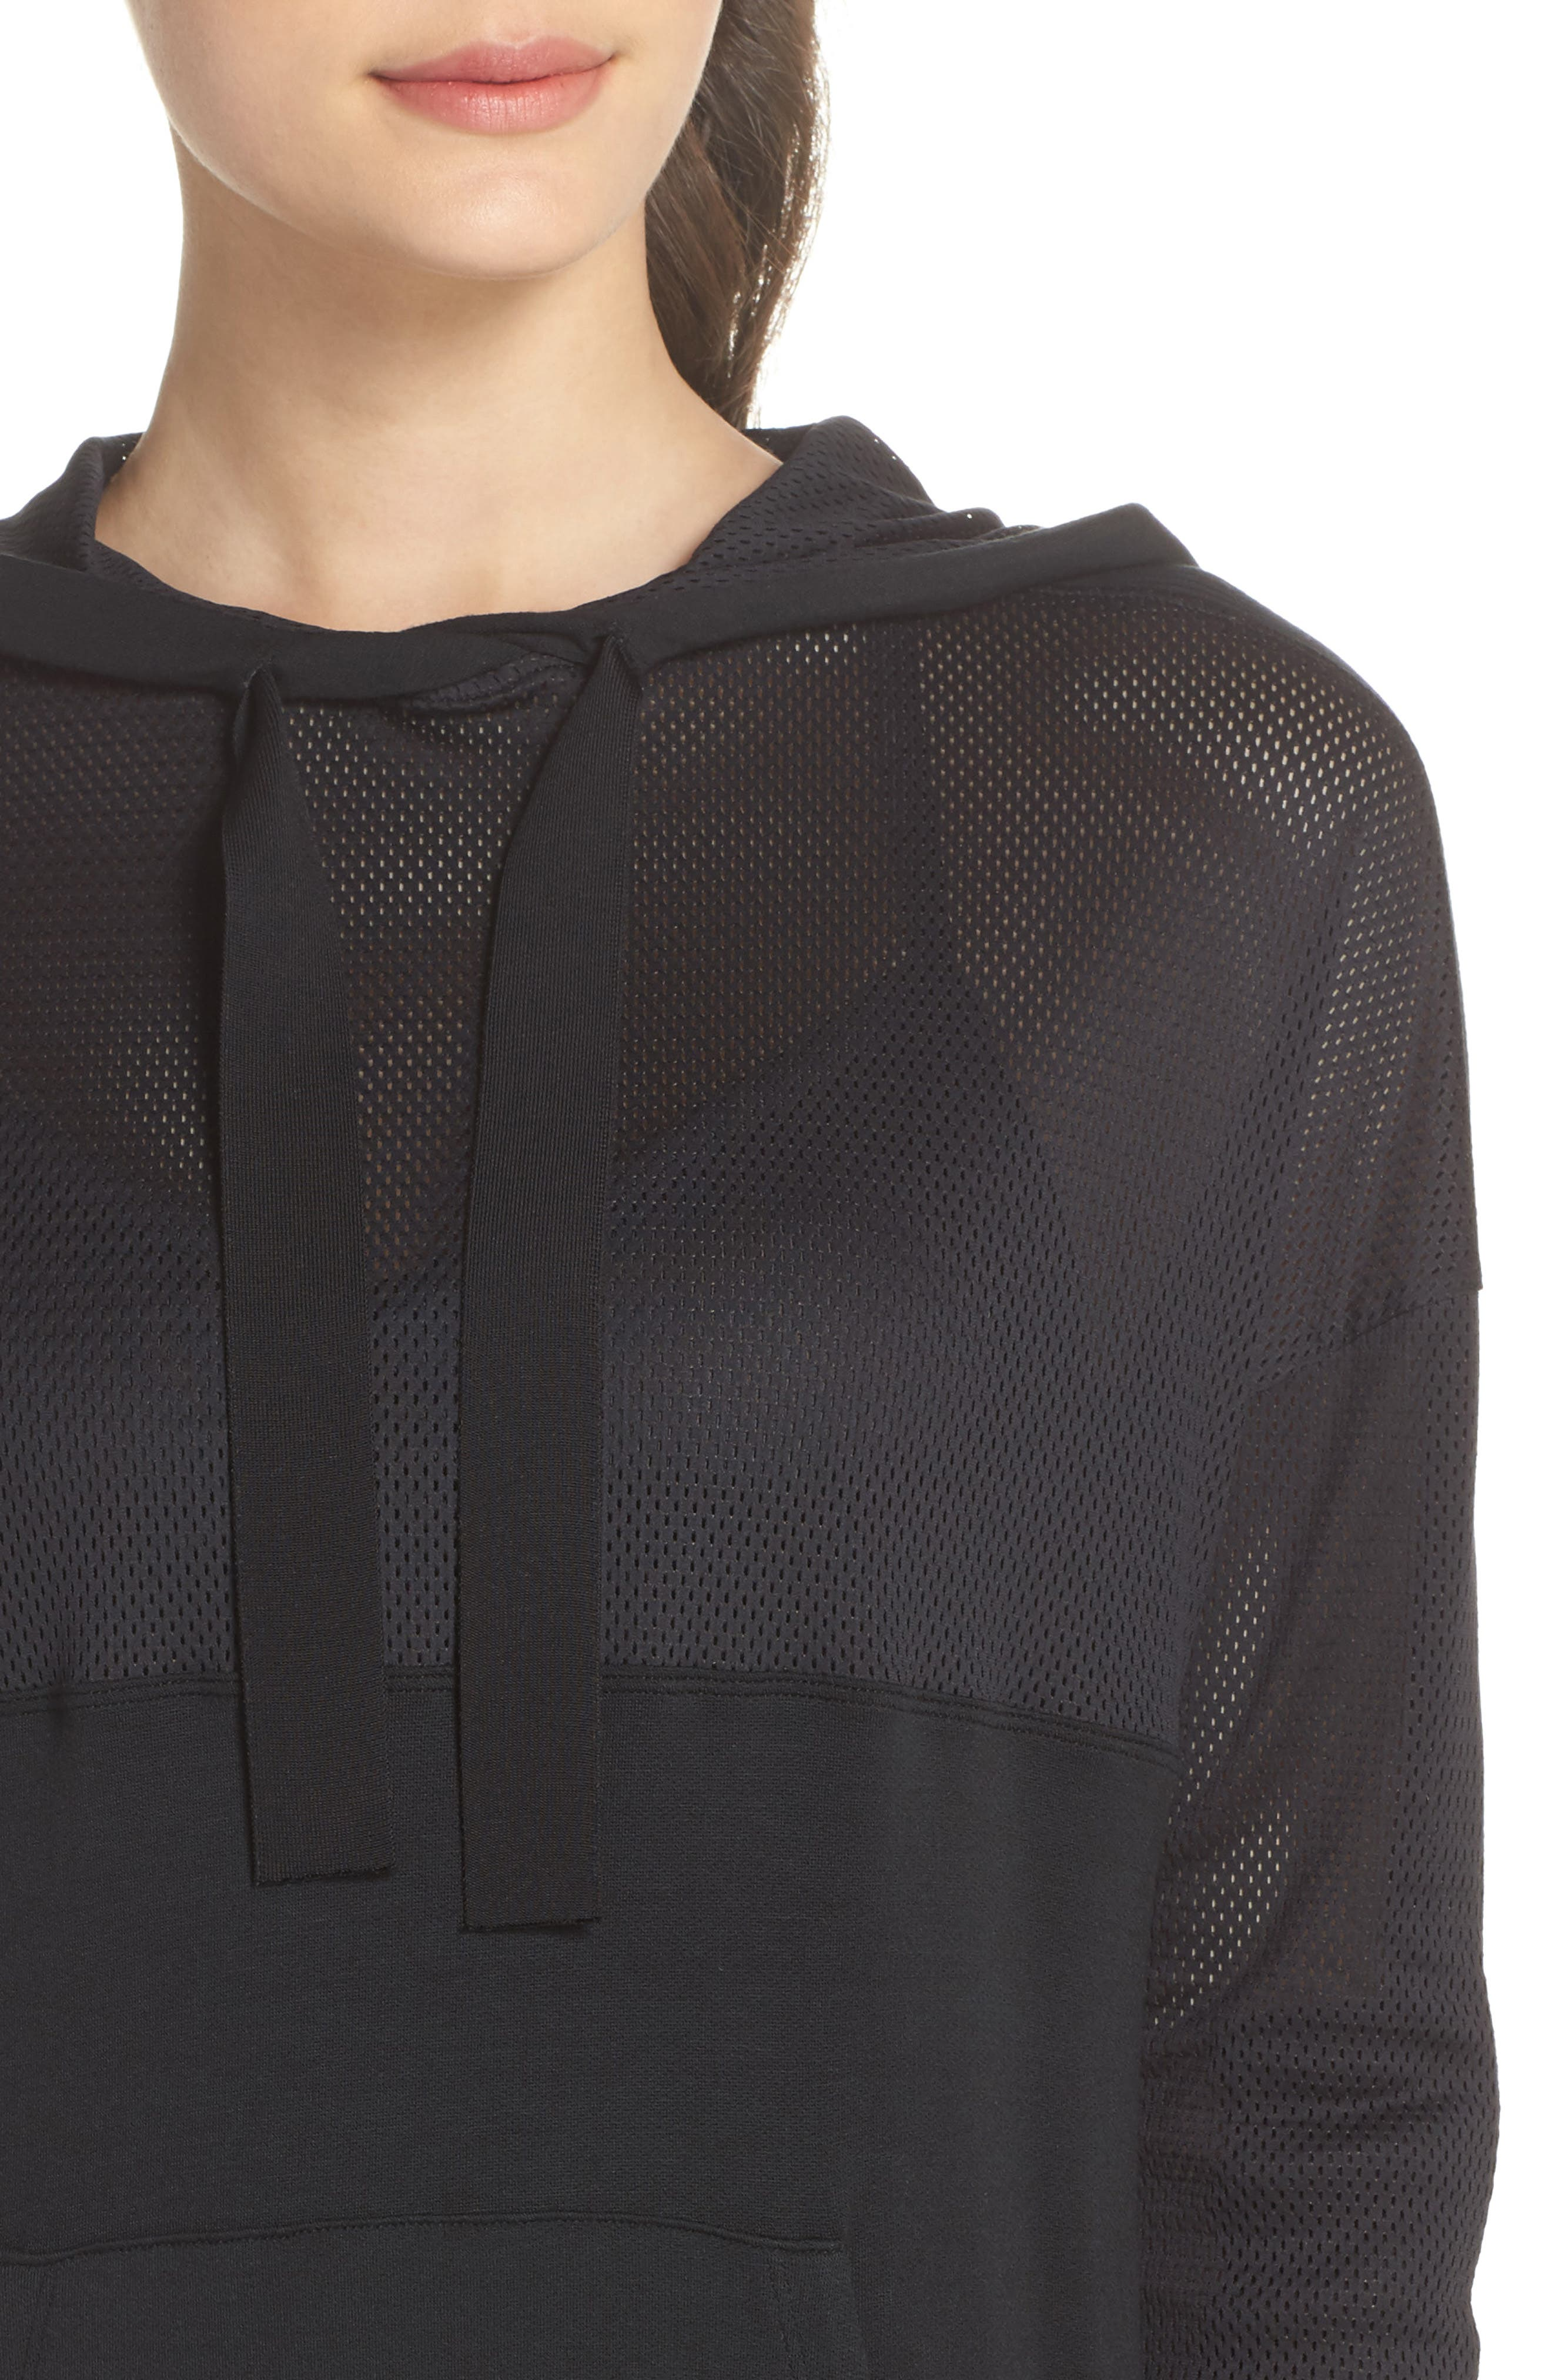 Range Dress,                             Alternate thumbnail 4, color,                             001